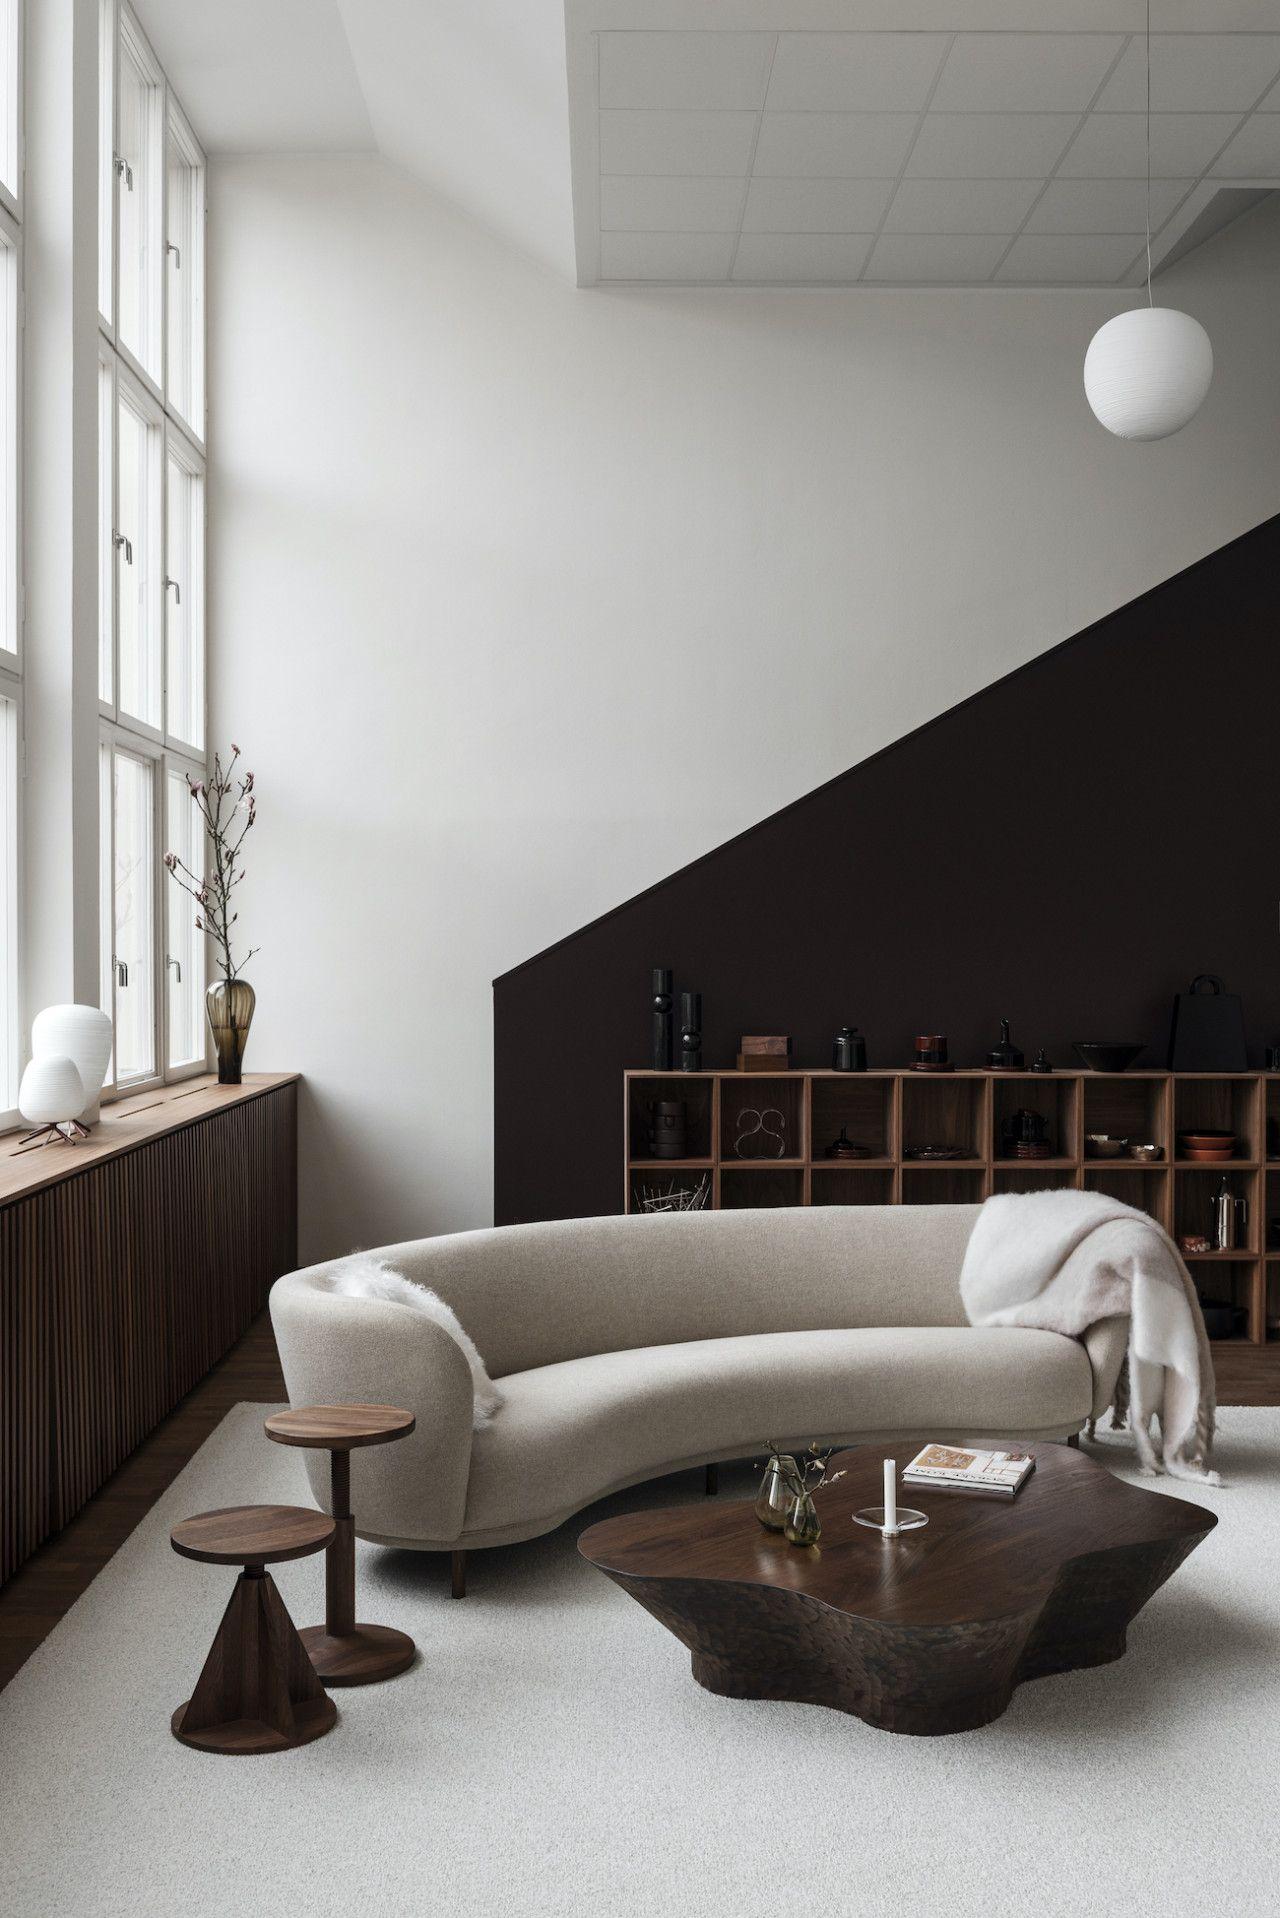 Grand Relations by Liljencrantz Design